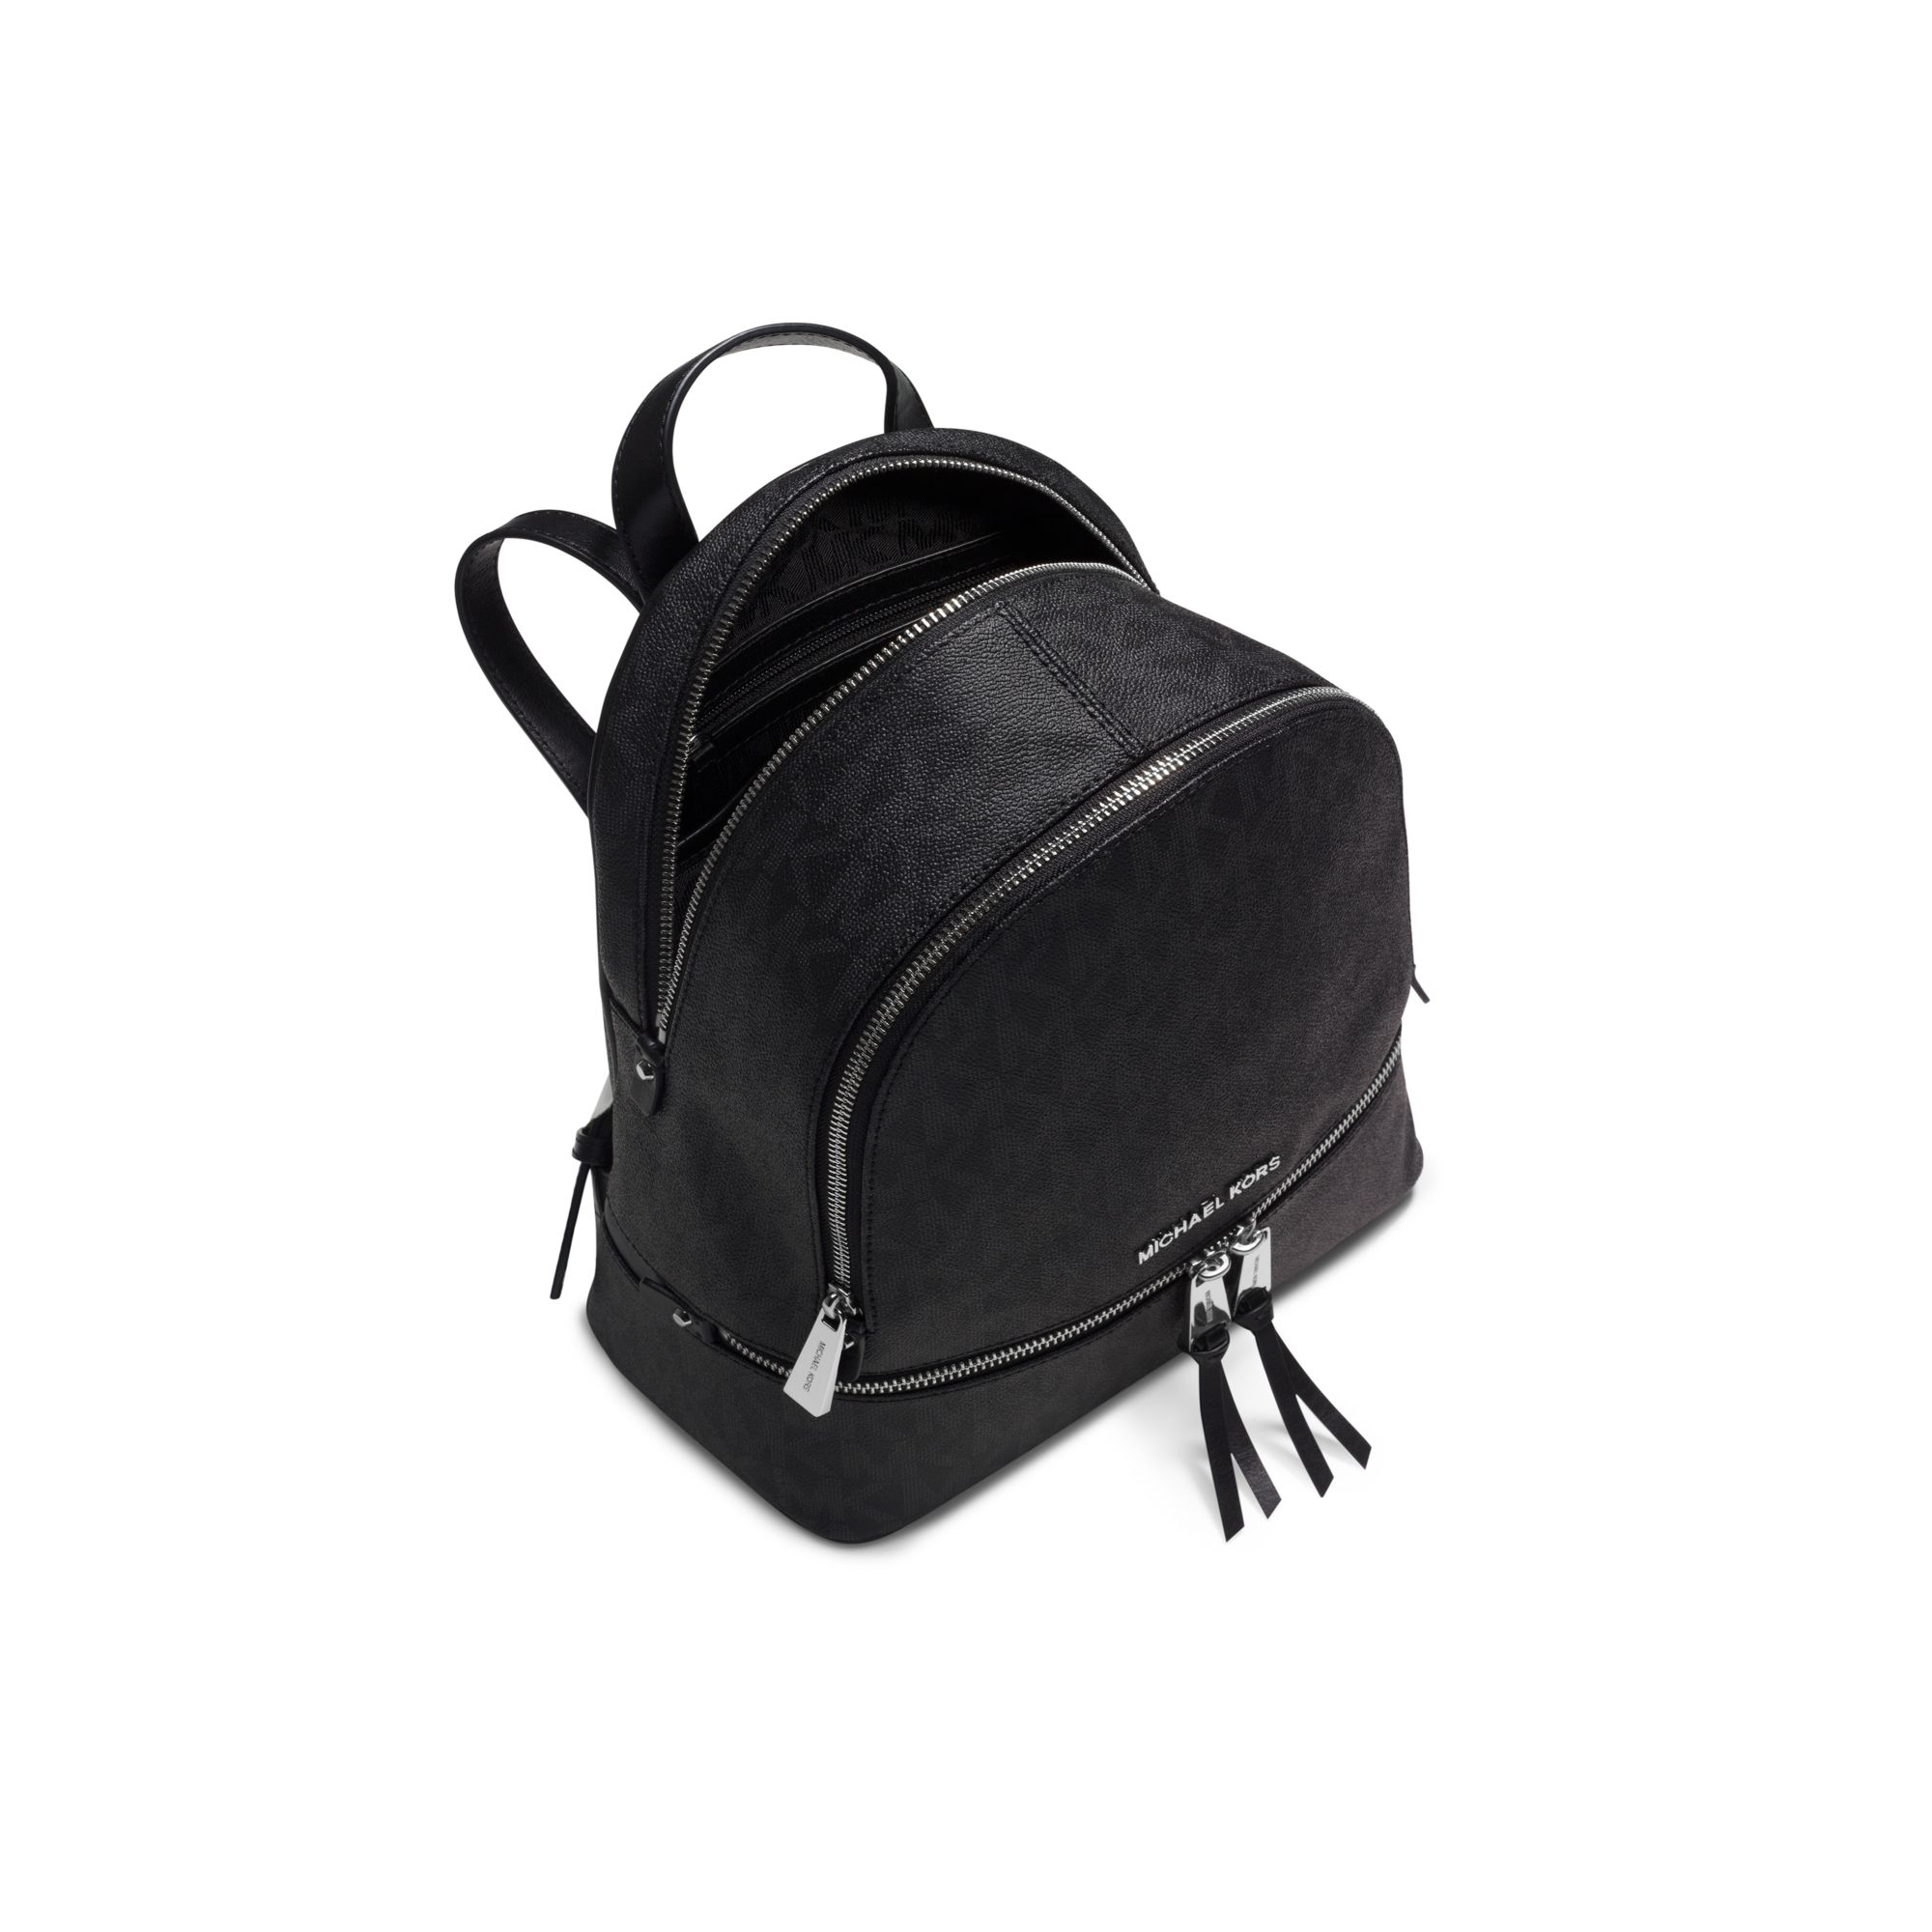 636bce1c86 Michael Kors Bags Backpack Skroutz